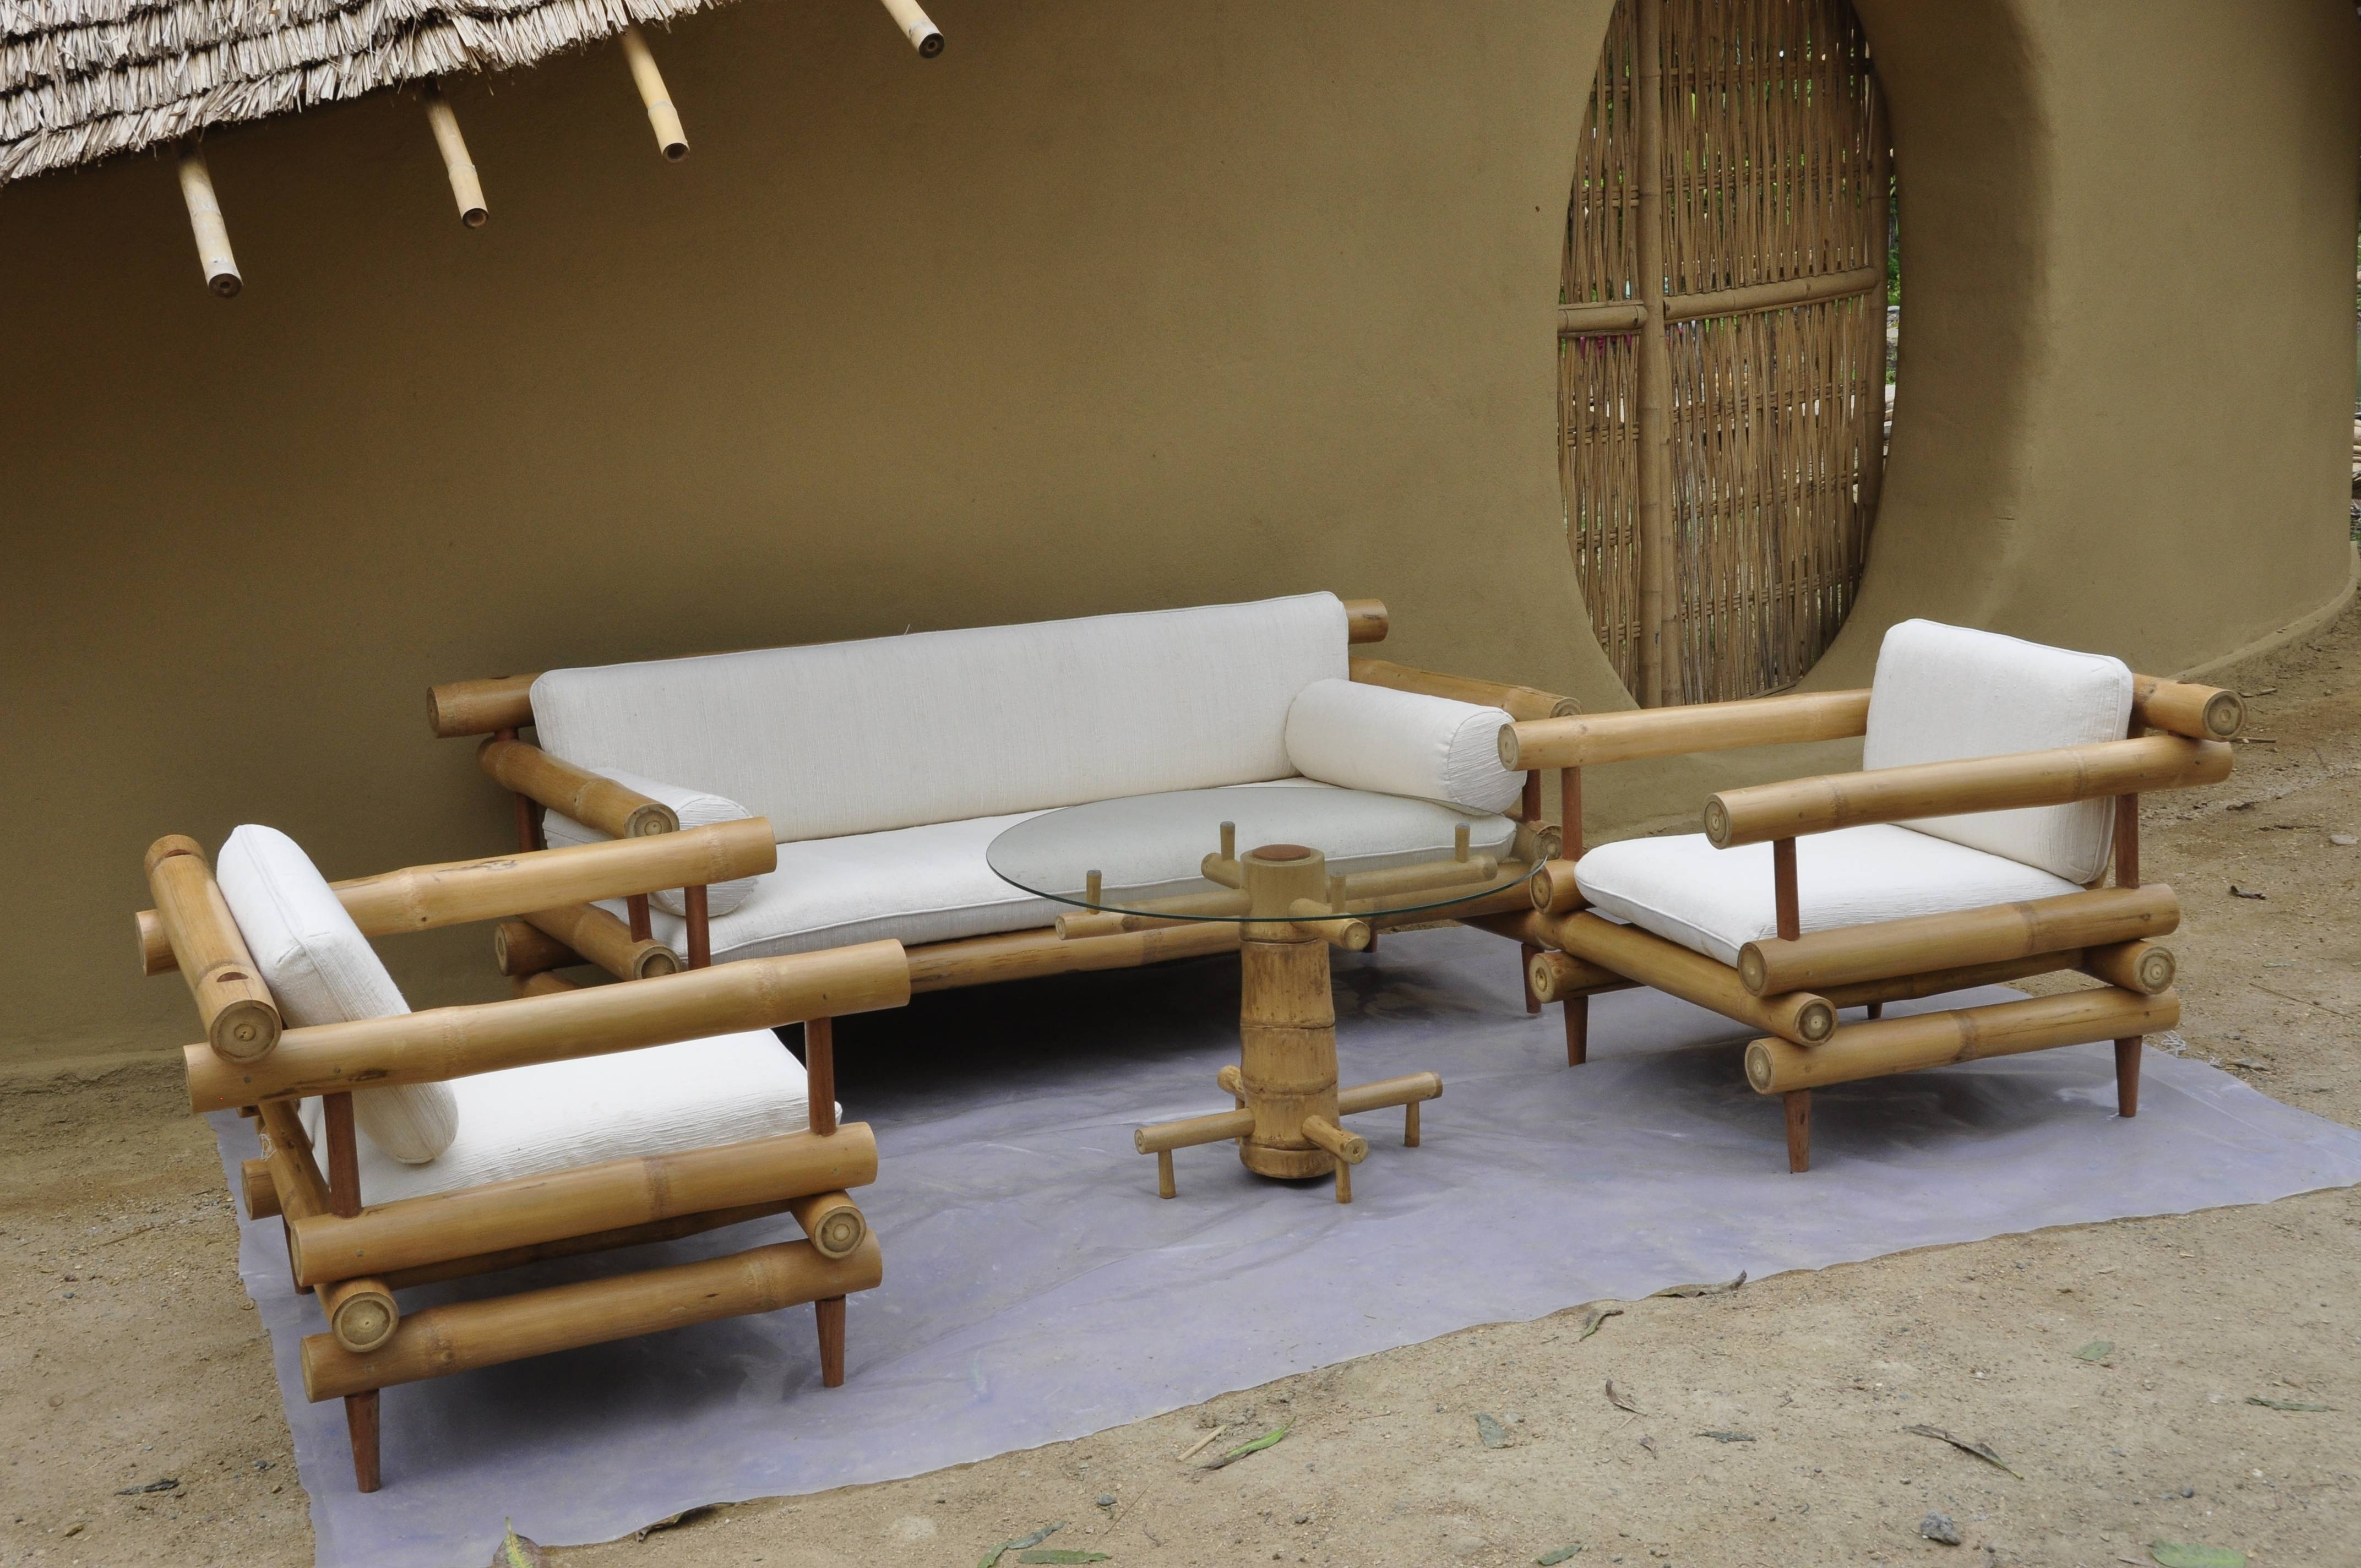 Bamboo Sofa Set (1) - Bamboo Earth Architecture - Chiangmai Life with Bamboo Sofas (Image 4 of 15)